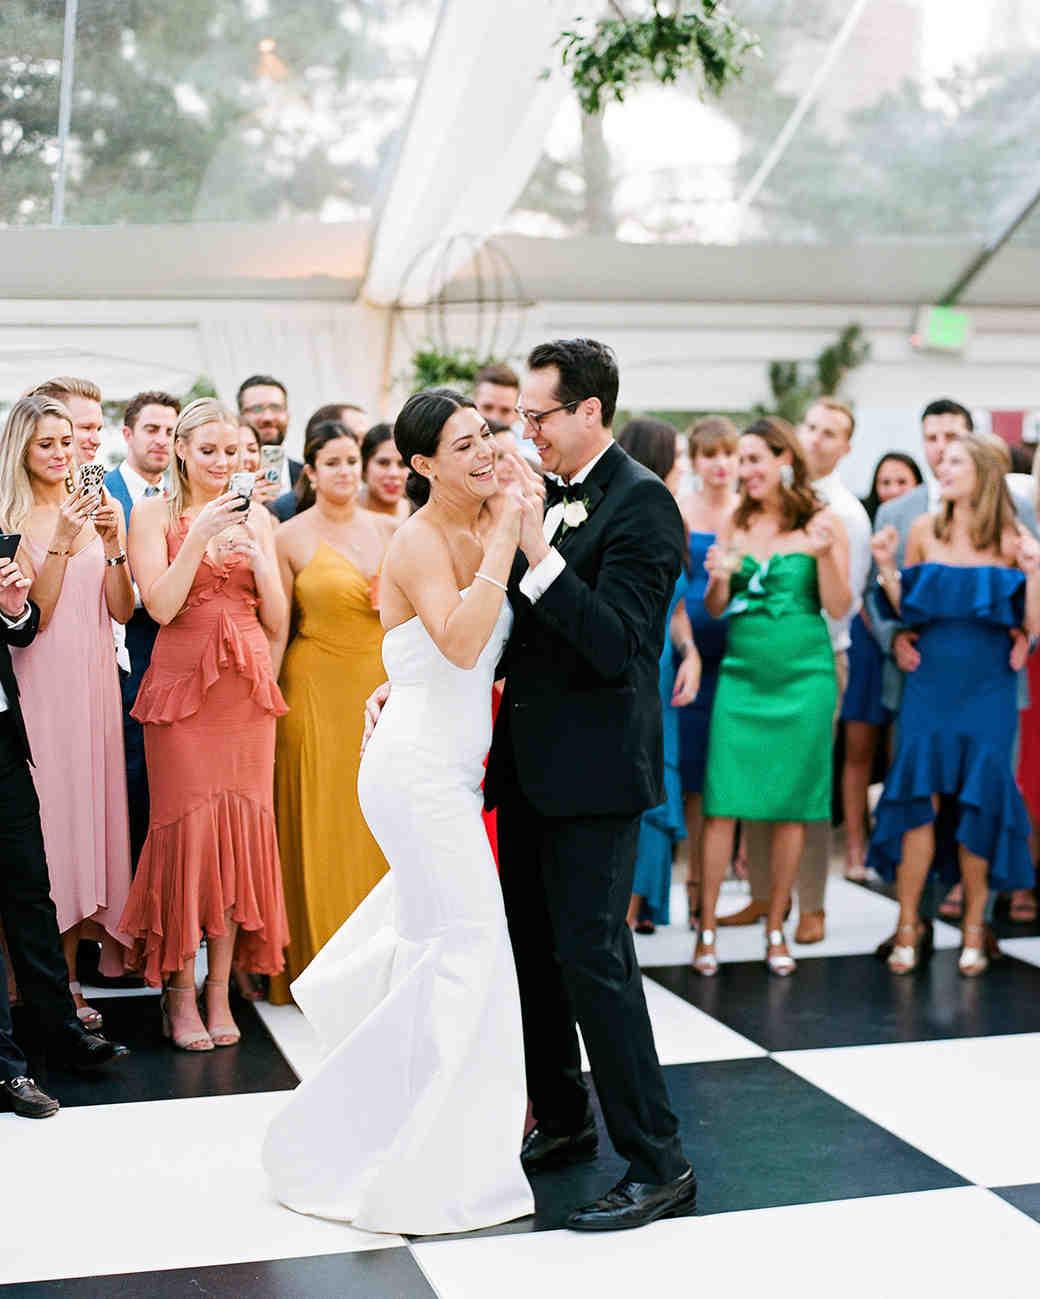 jamie jon wedding first dance